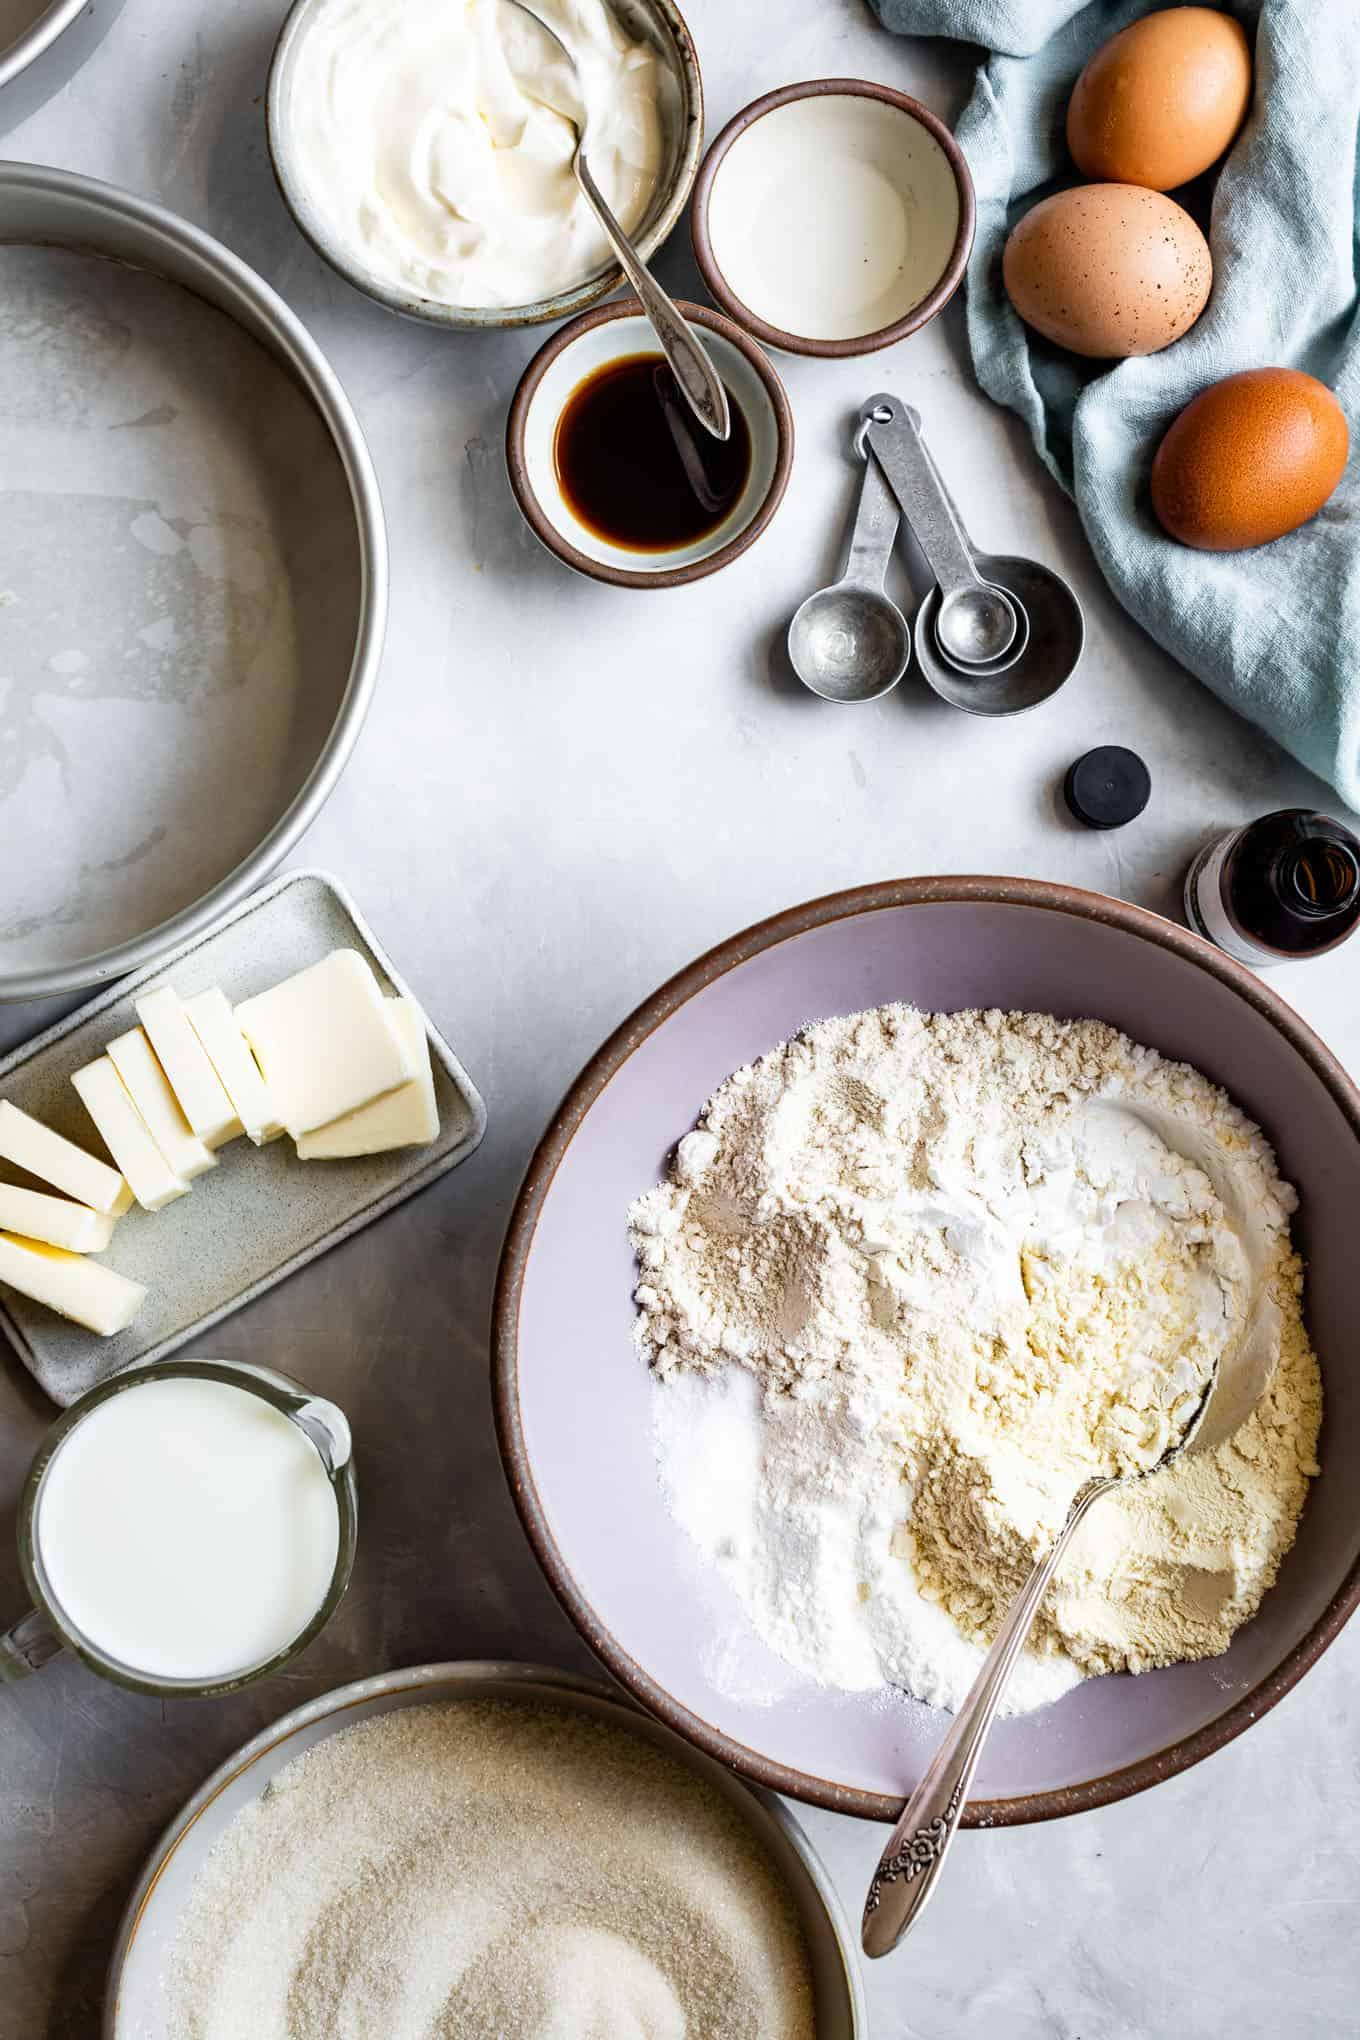 Best Gluten-Free Flour for Cakes